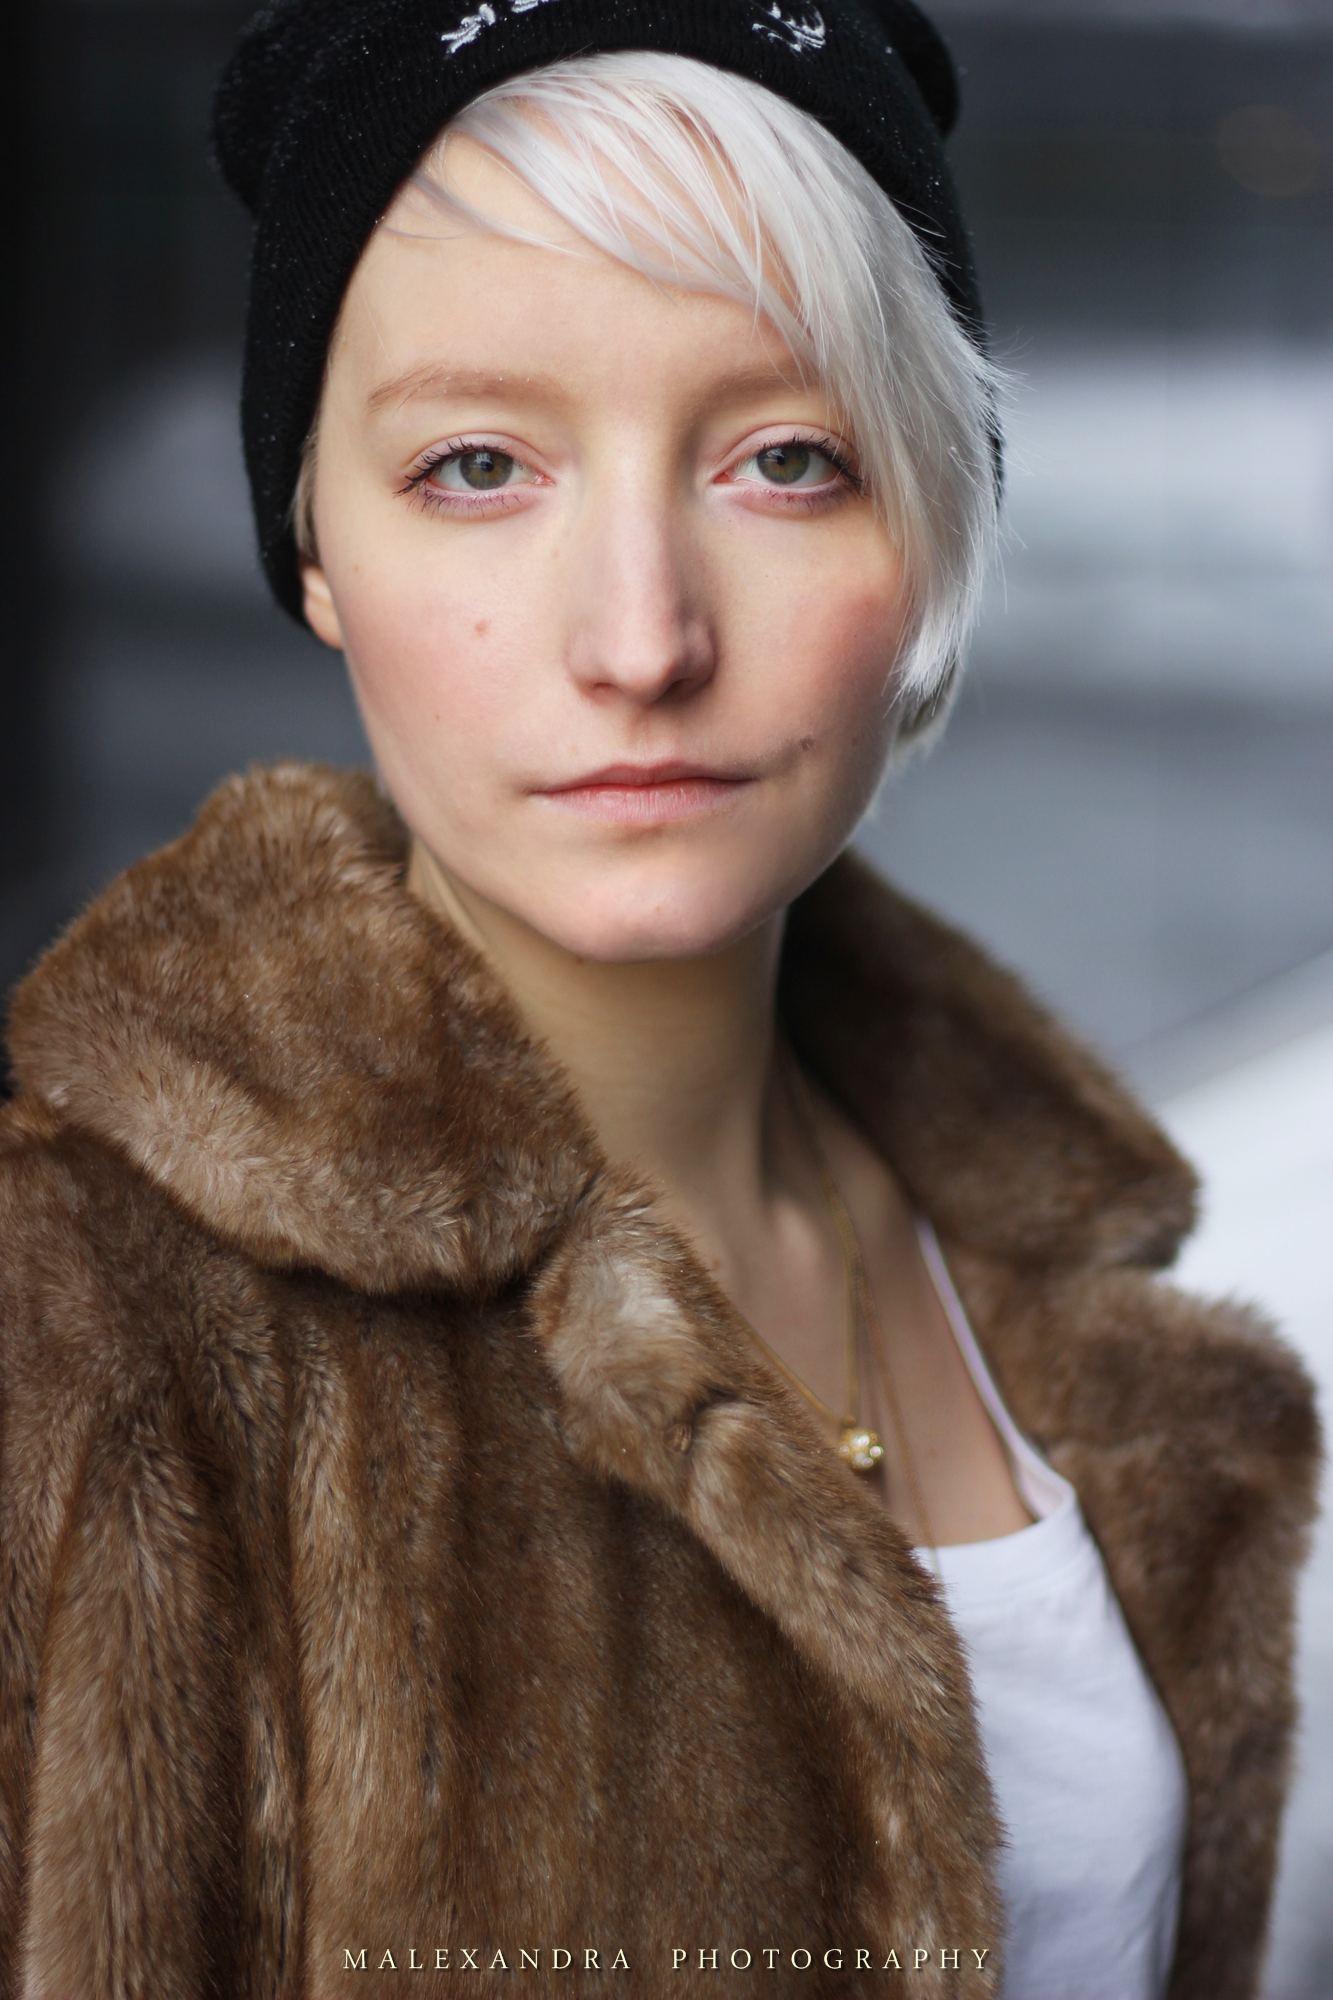 Karolina Żebrowska Matropolitan021Malexandra Photography